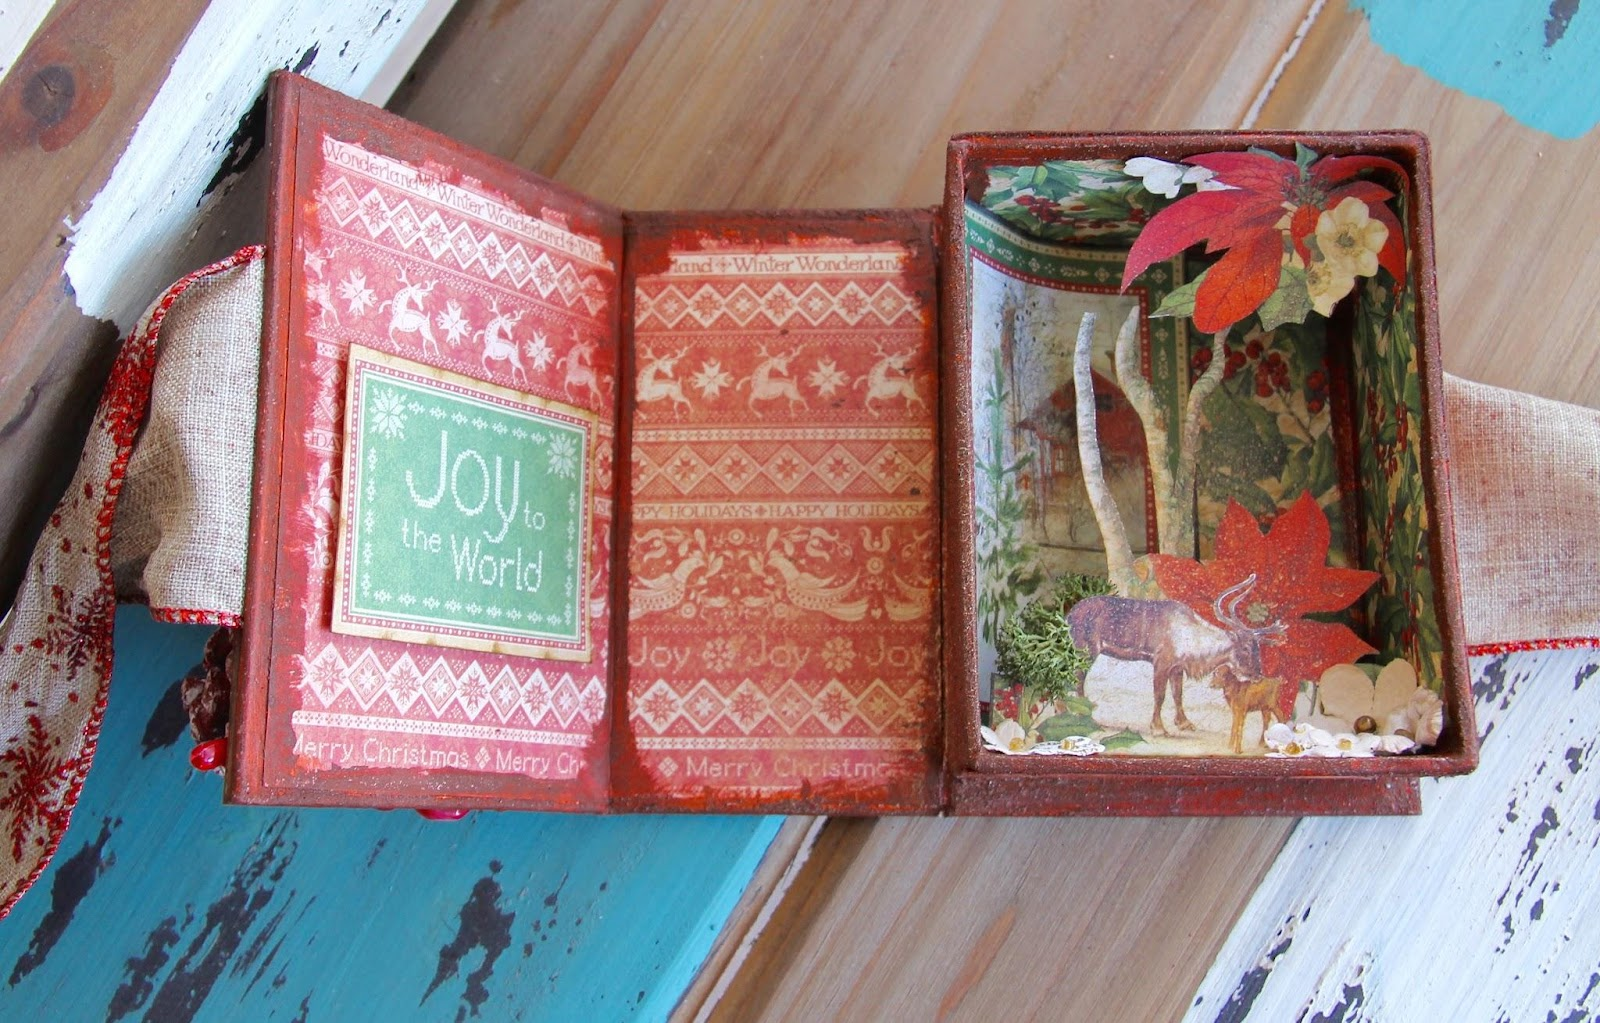 Winter Wonderland Book Box by Marina Blaukitchen Product by Graphic 45 photo 9.jpg